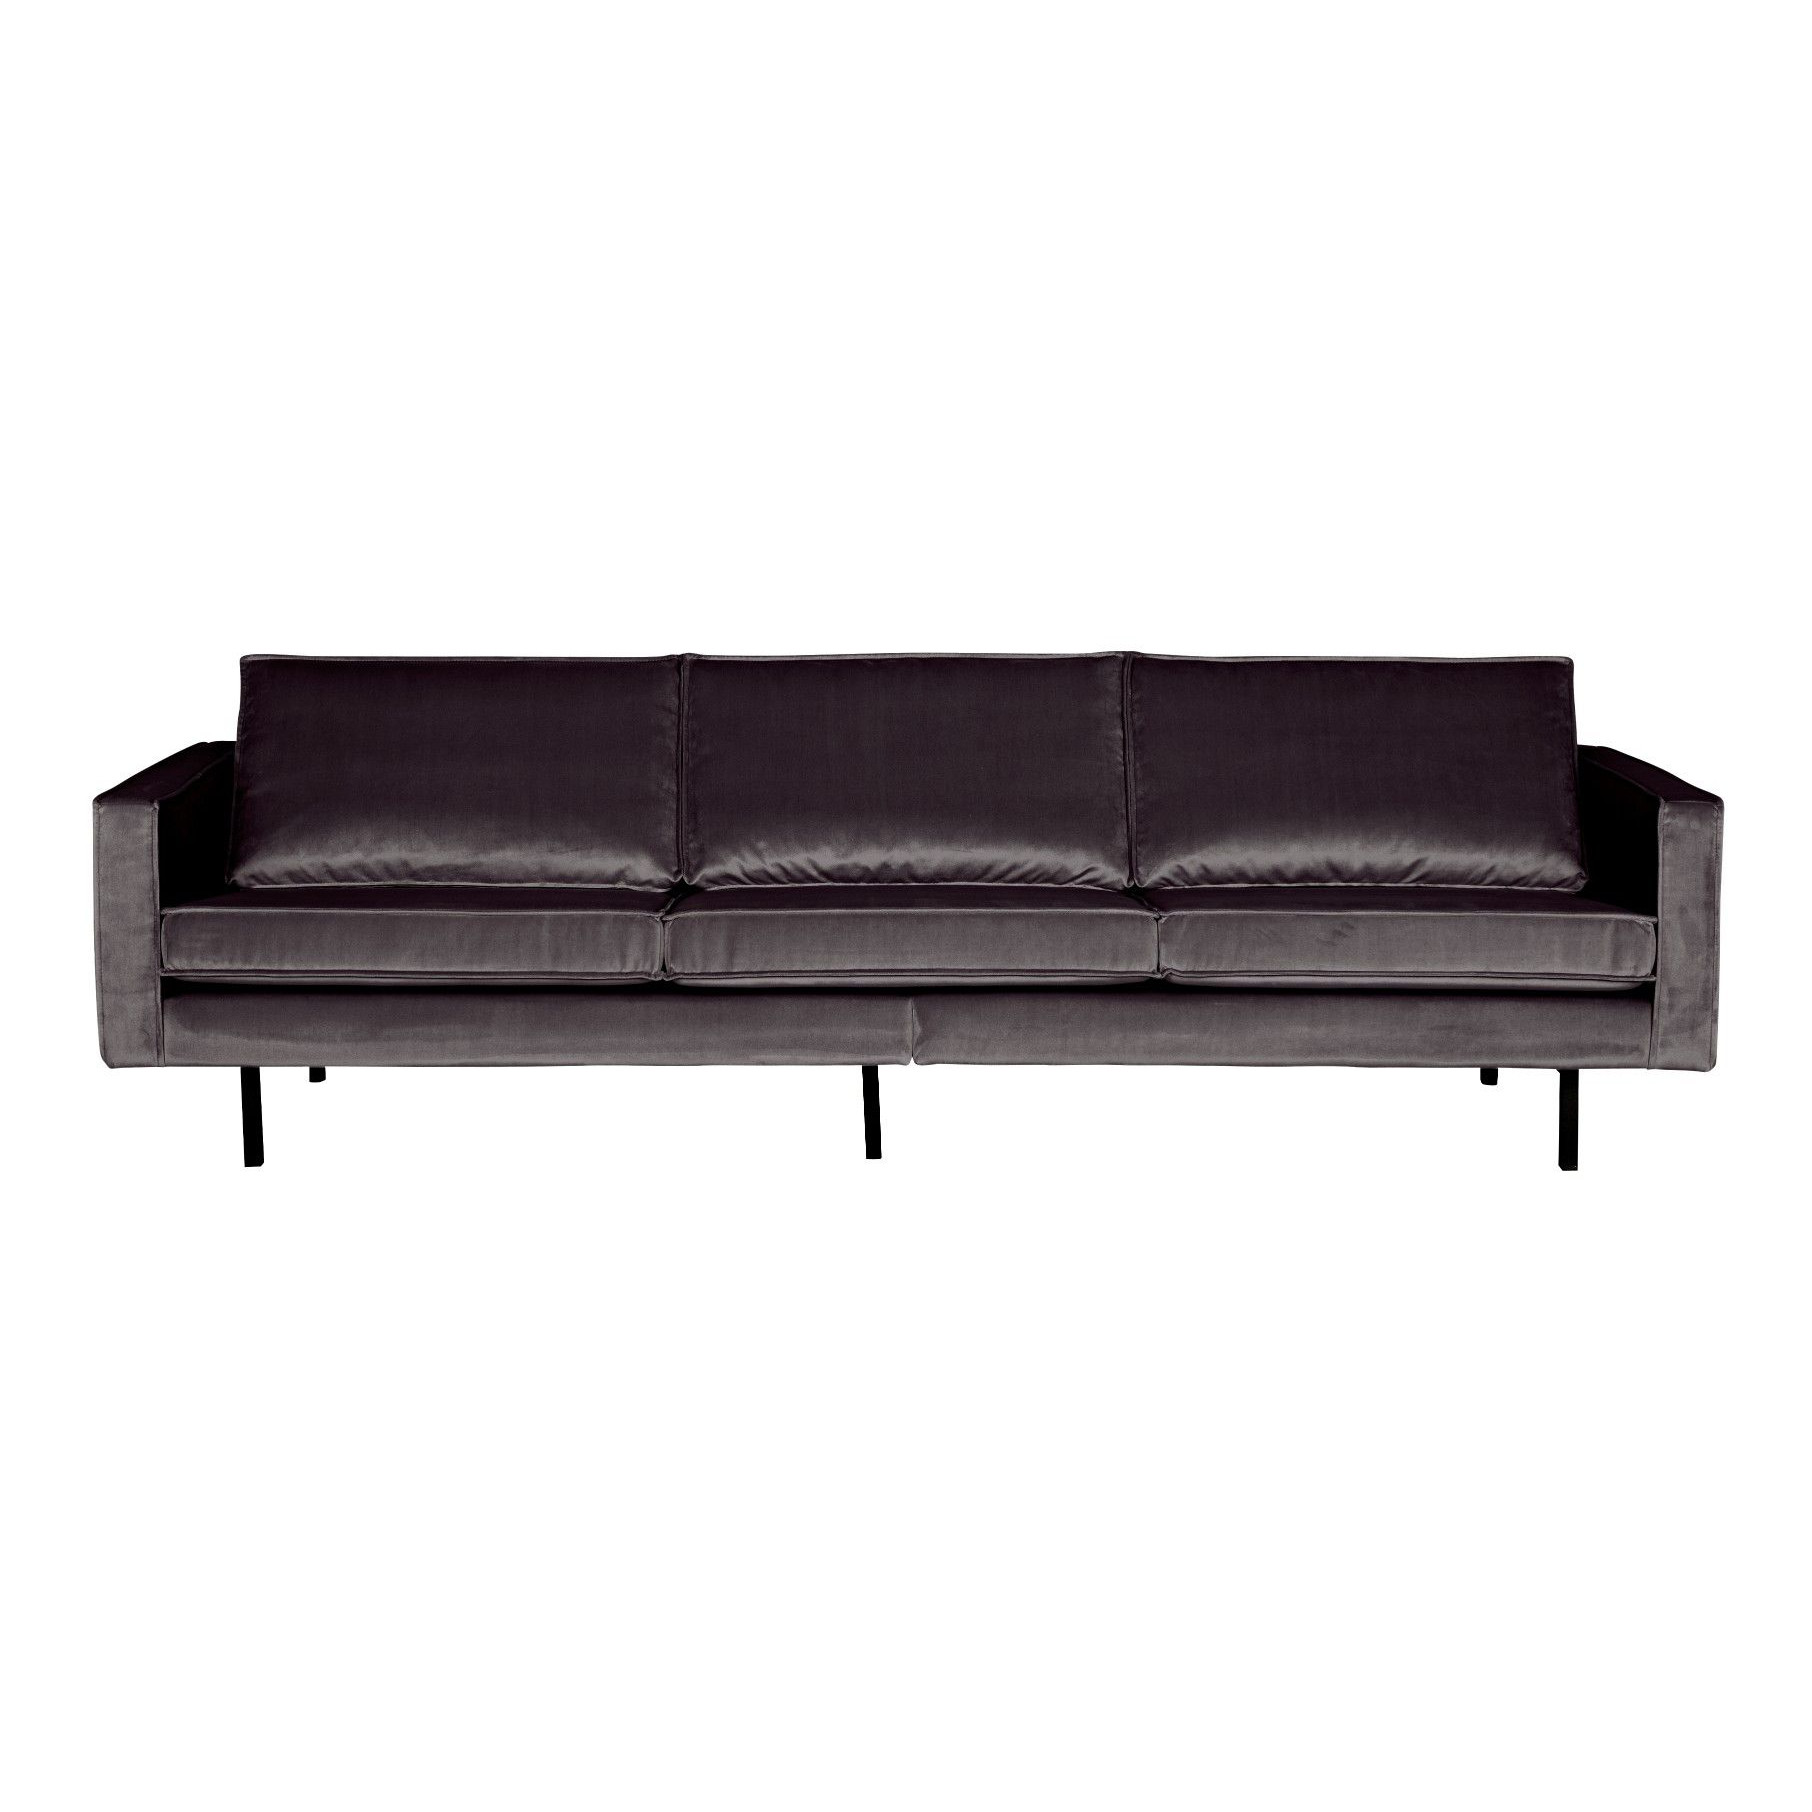 3-Sitzer-Sofa Rodeo Samt | Anthrazit